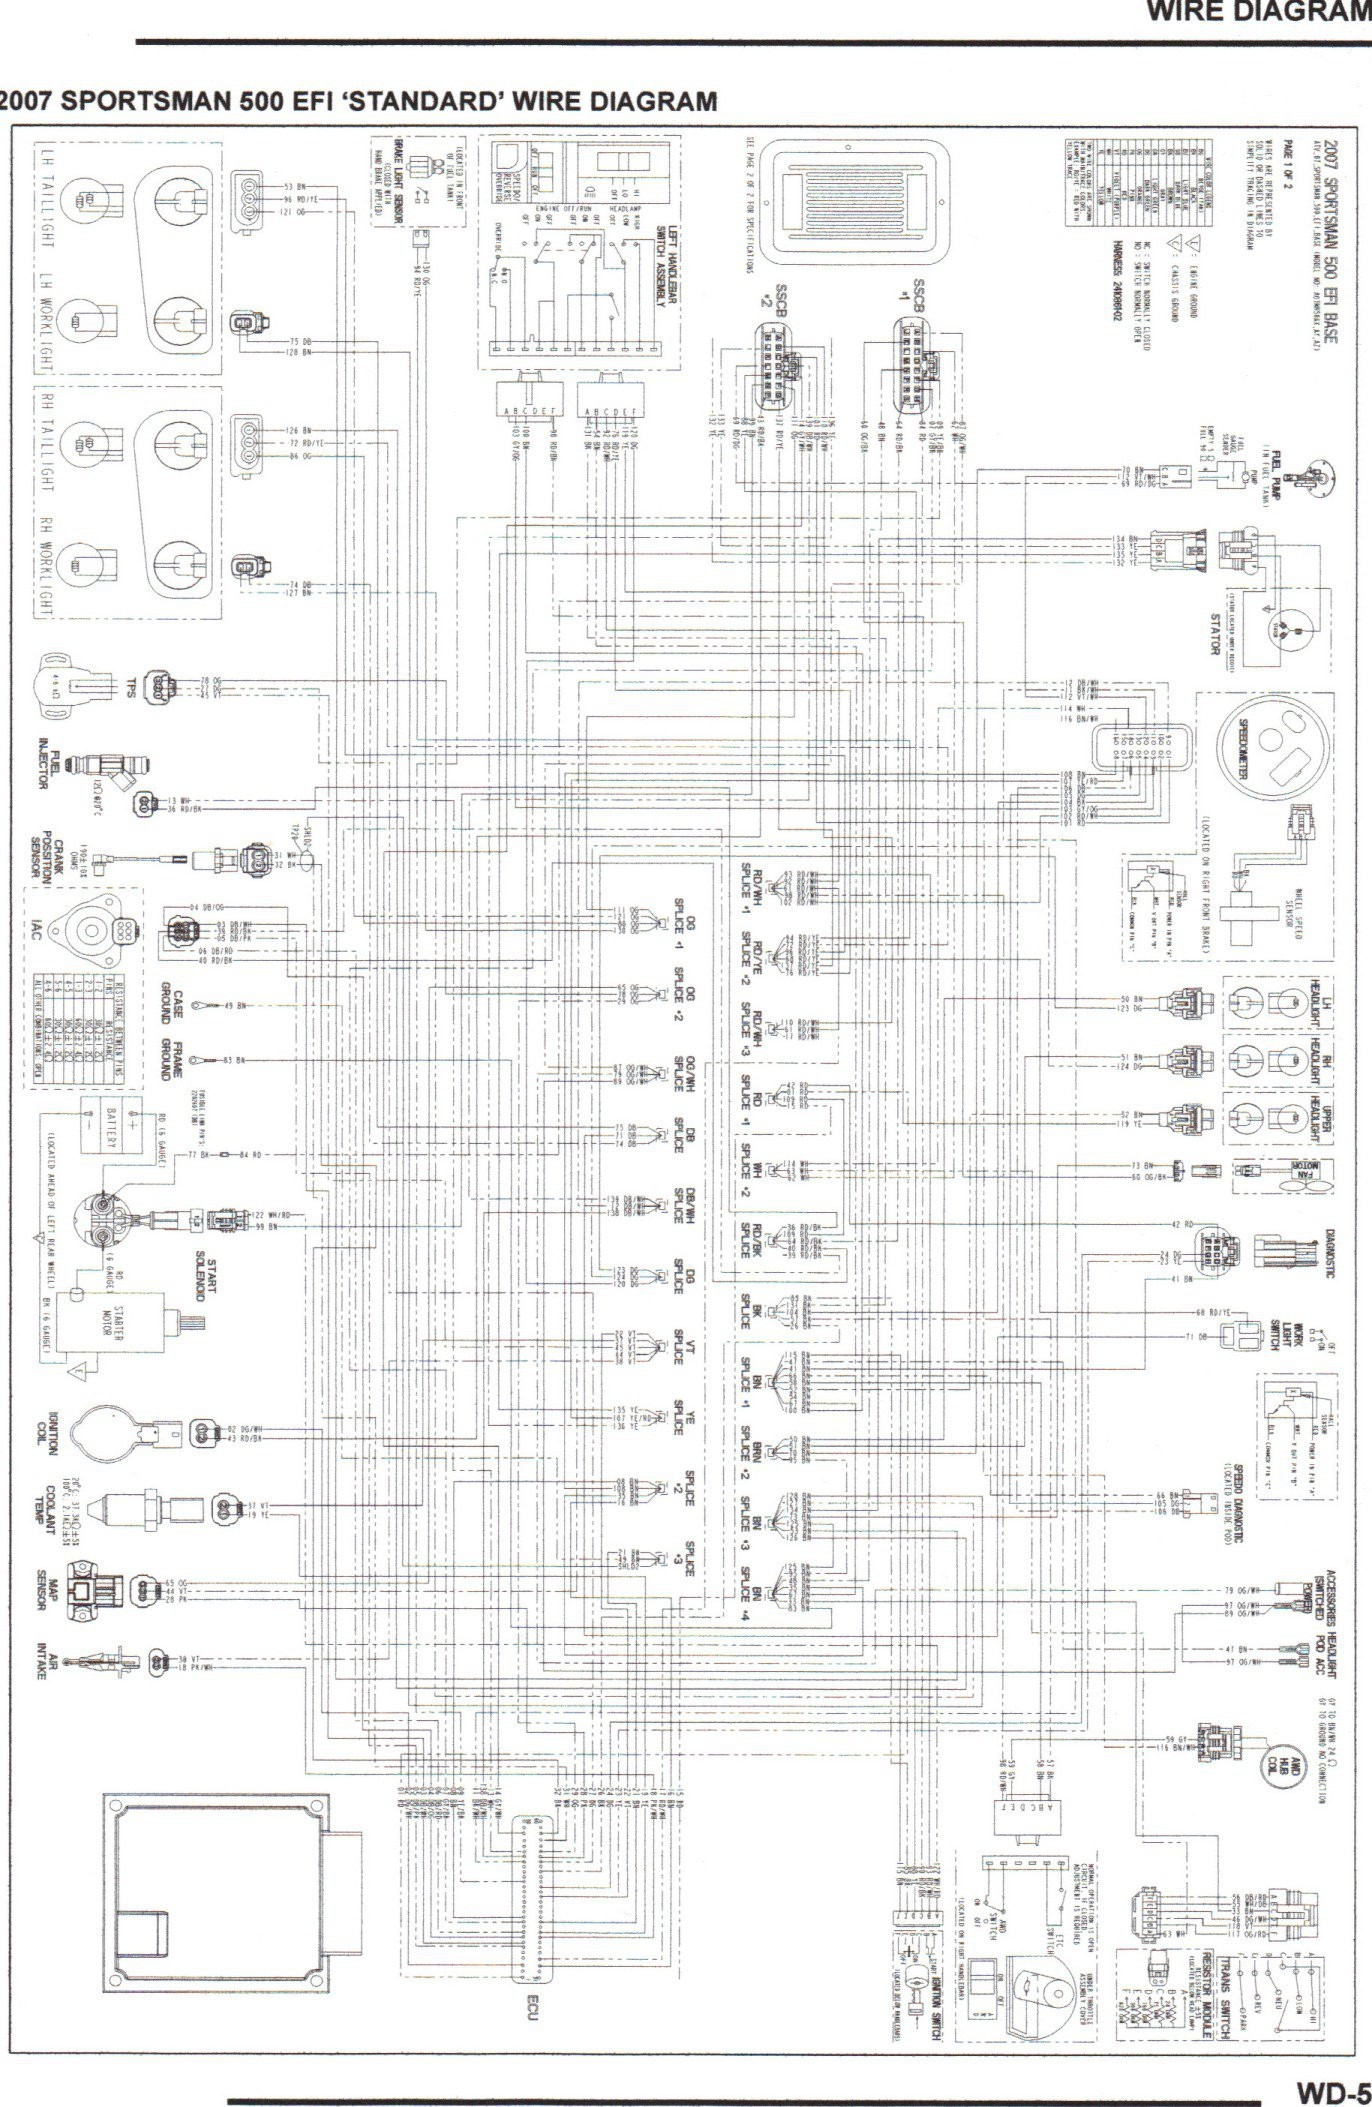 Polaris Wiring Diagram List Wiring Diagram Od Rv Park – Jmcdonaldfo – Wiring Diagram Collection